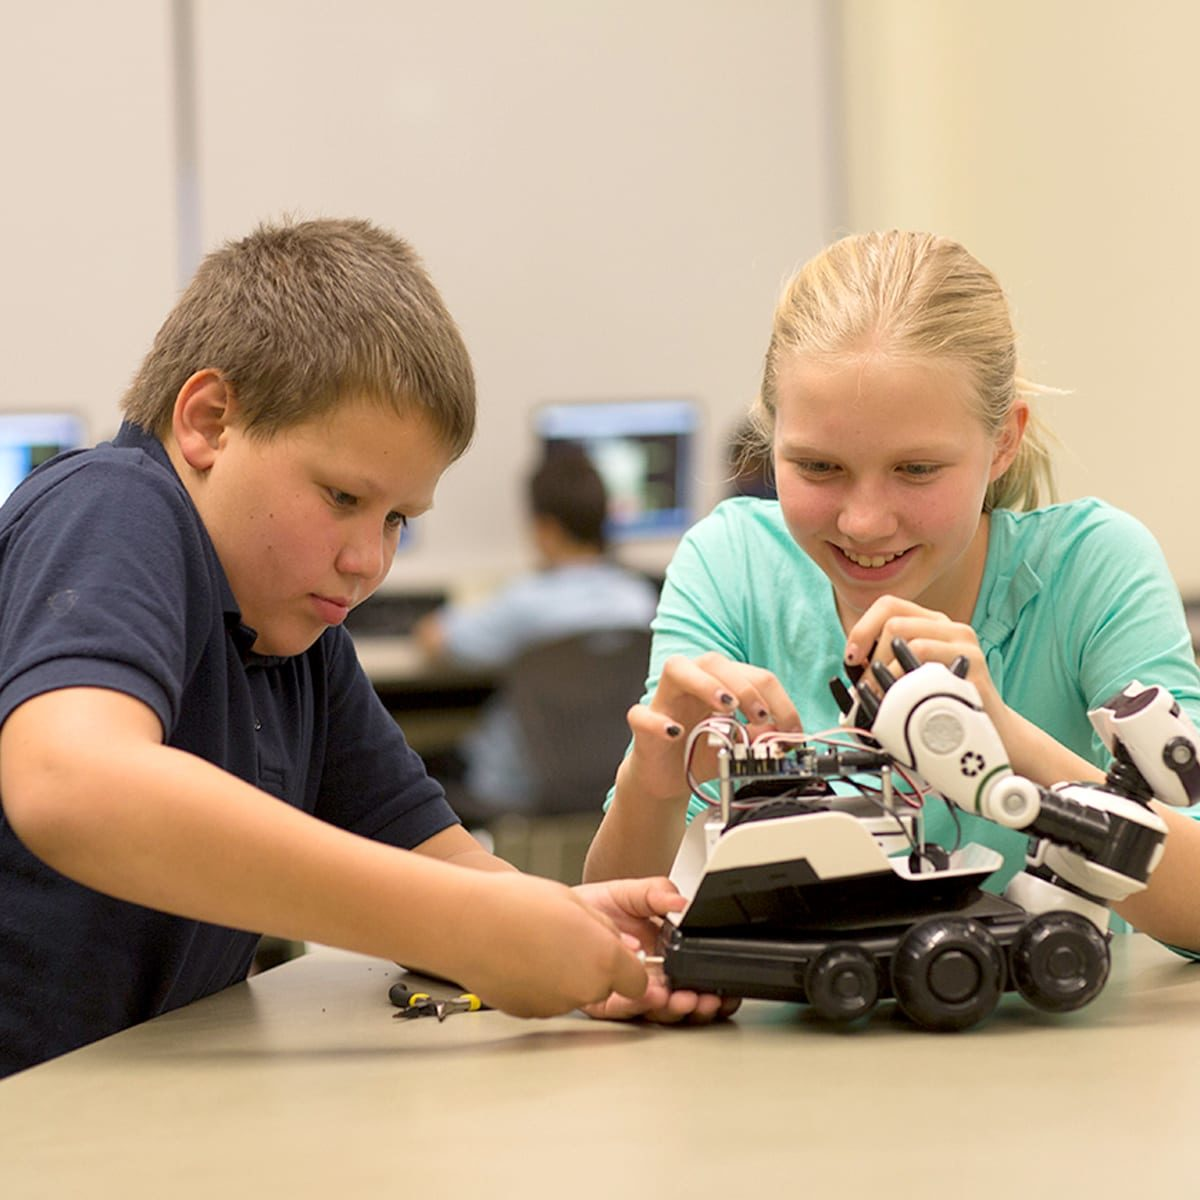 kids working on robot